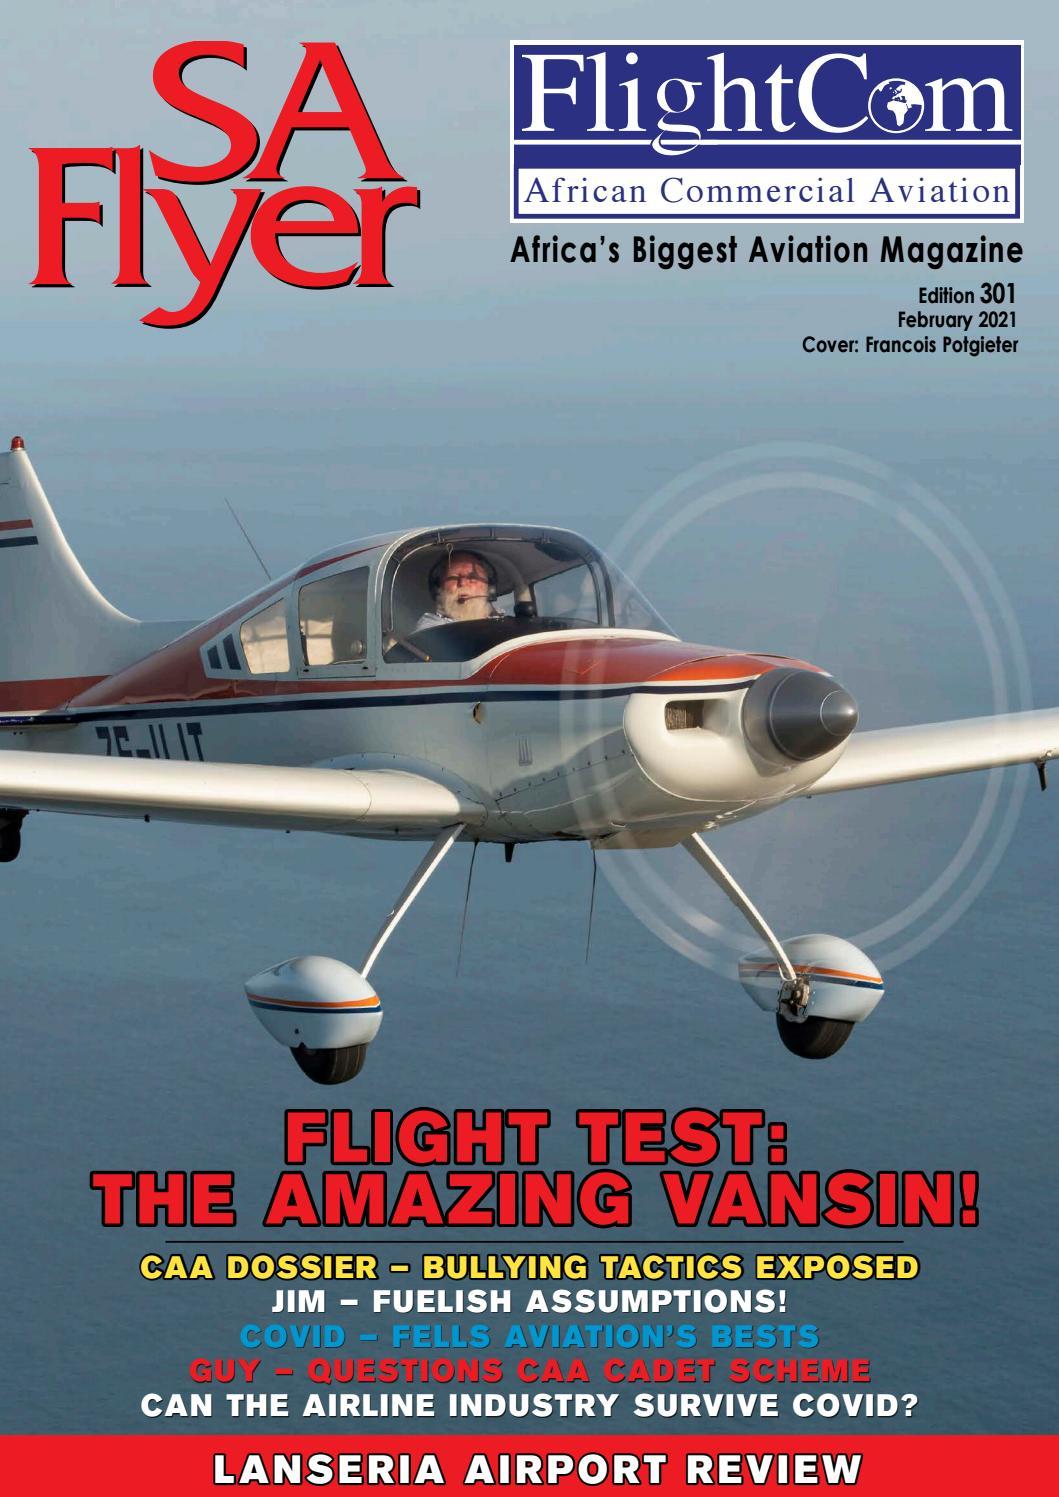 Photo Frame 172 Hub off a Cessna Skyhawk Airplane Propeller amazing birthday present